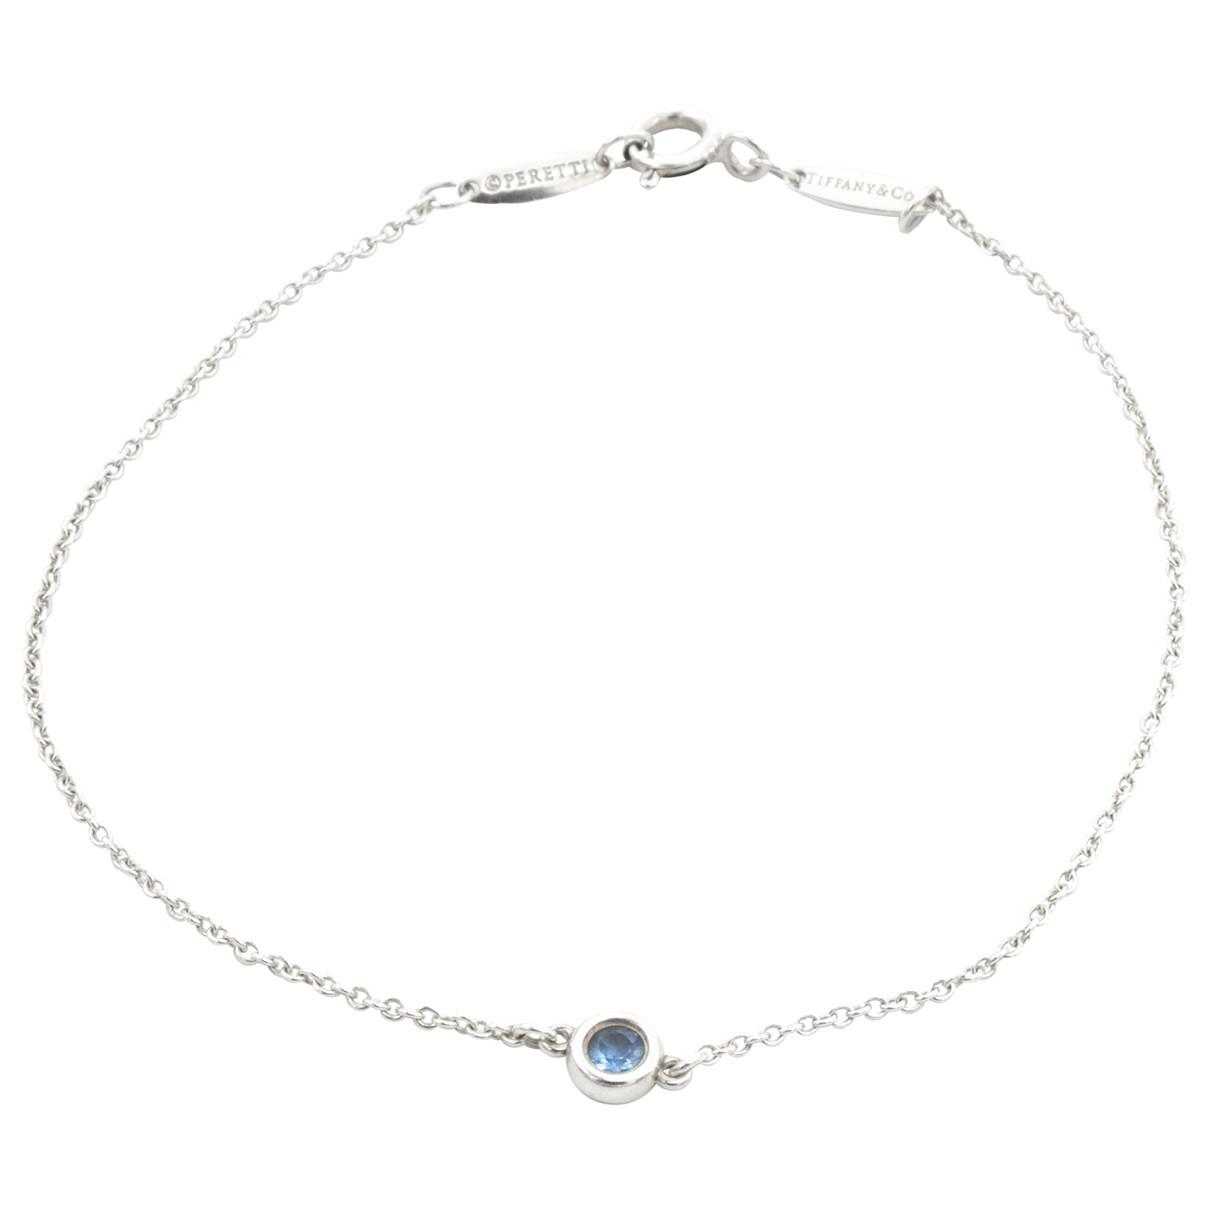 Tiffany & Co Elsa Peretti  Armband in  Silber Silber